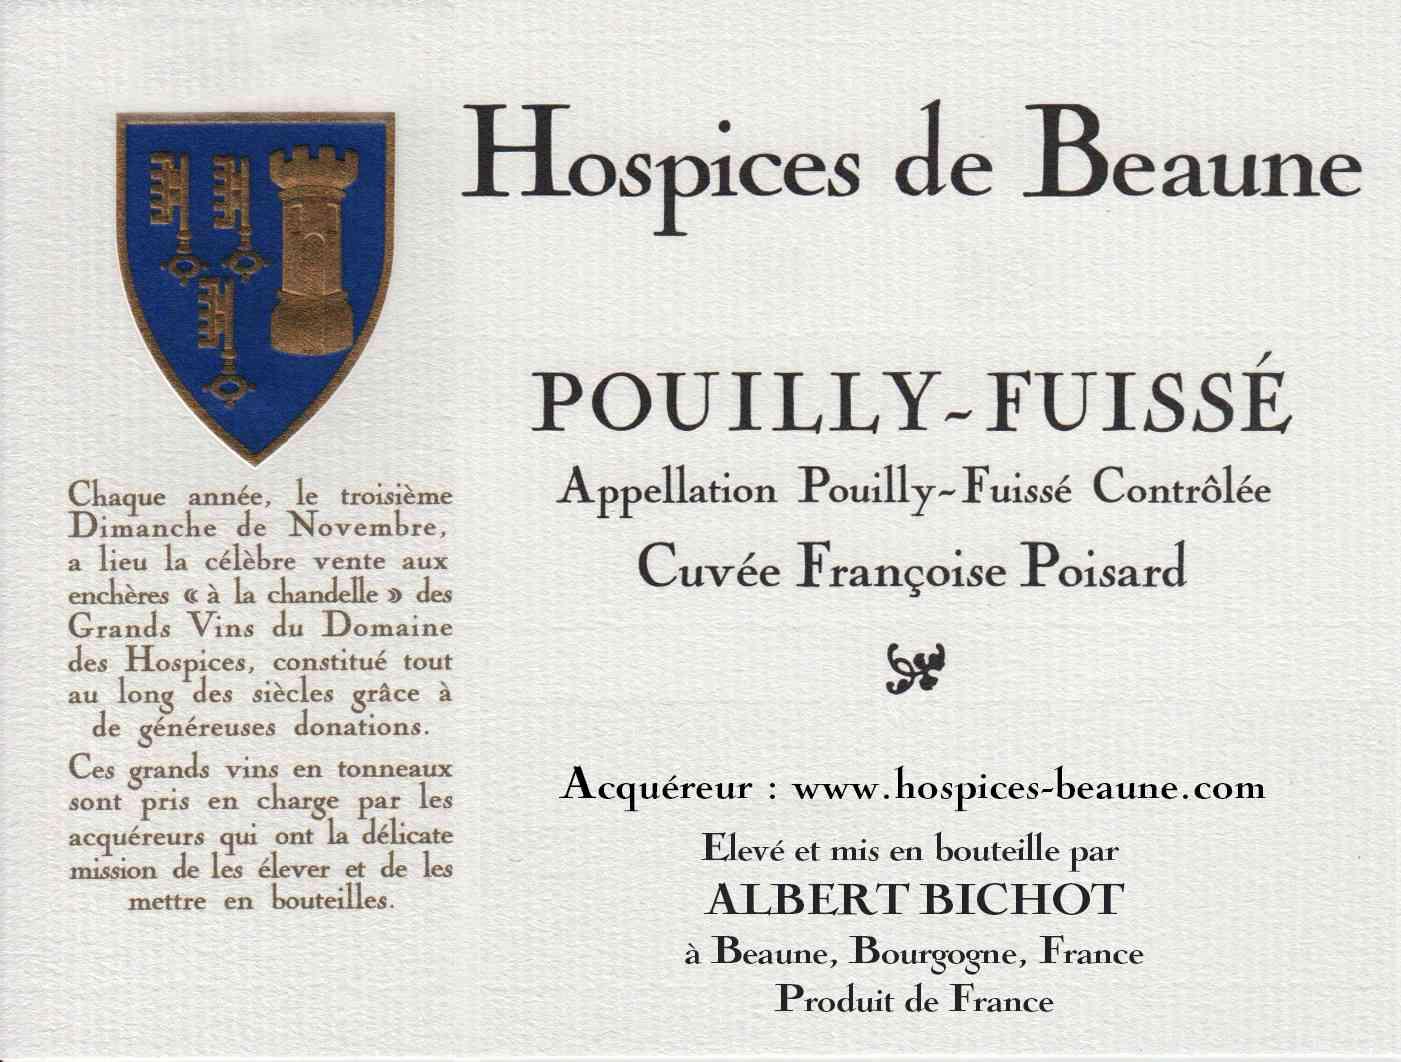 Encheres-auction-HospicesdeBeaune-AlbertBichot-PouillyFuisse-Cuvee-FrançoisePoisard